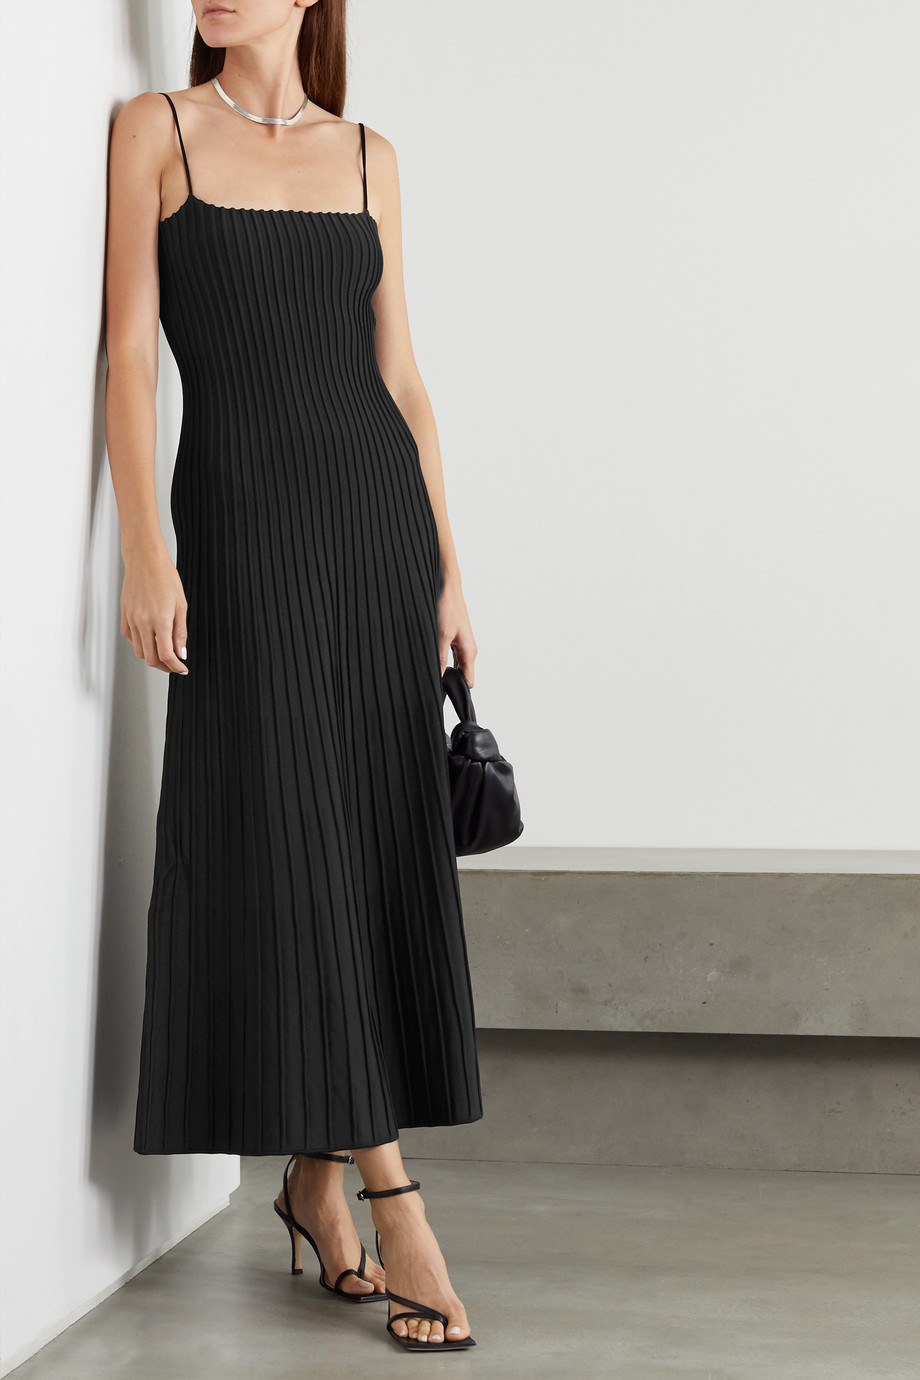 CASASOLA + NET SUSTAIN Carlotta ribbed stretch-knit midi dress